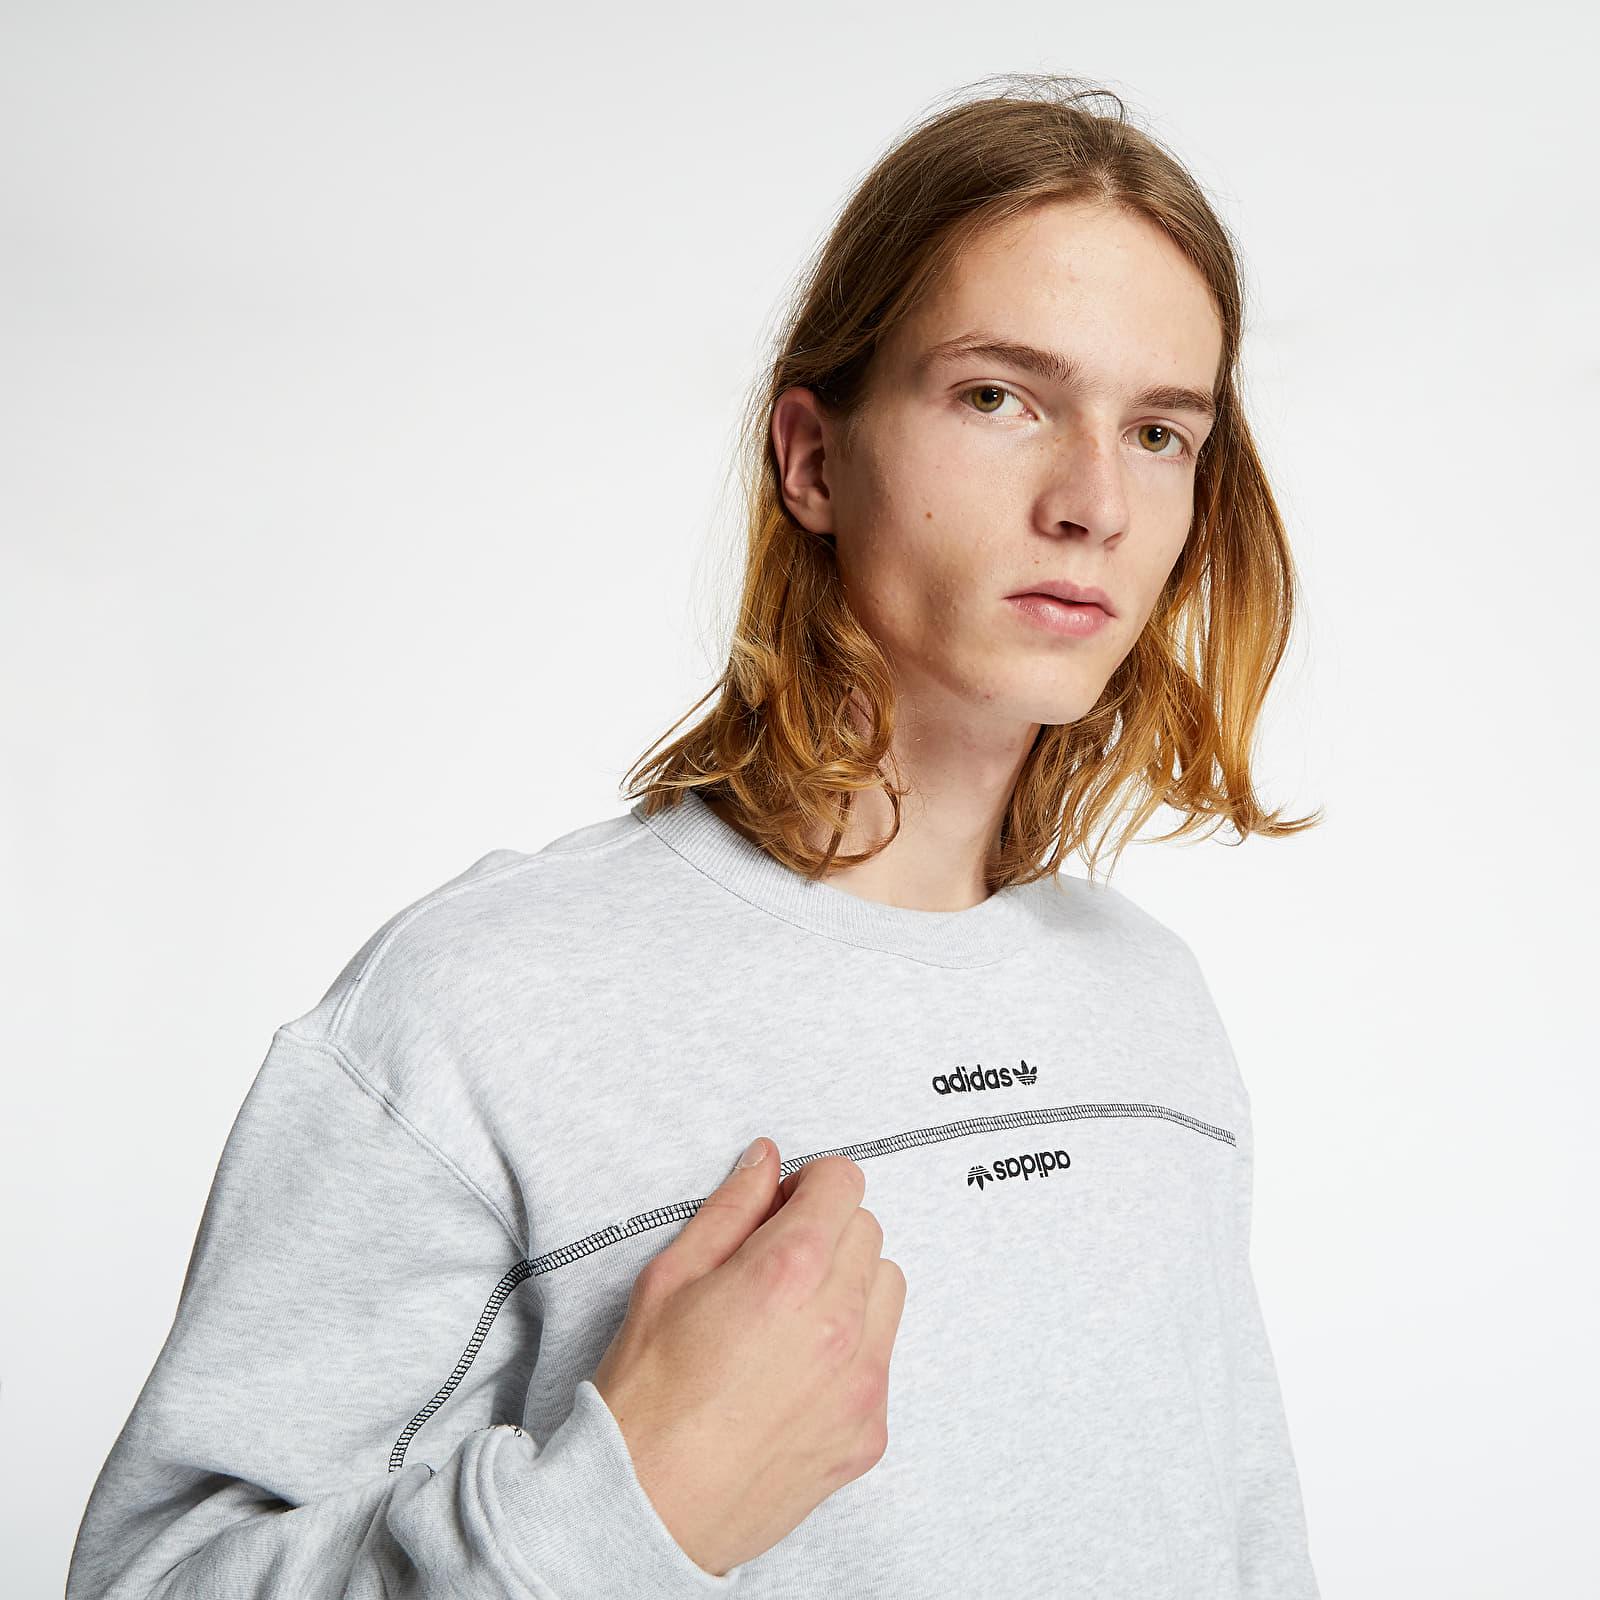 Sweatshirts adidas F Crewneck Light Grey Heather